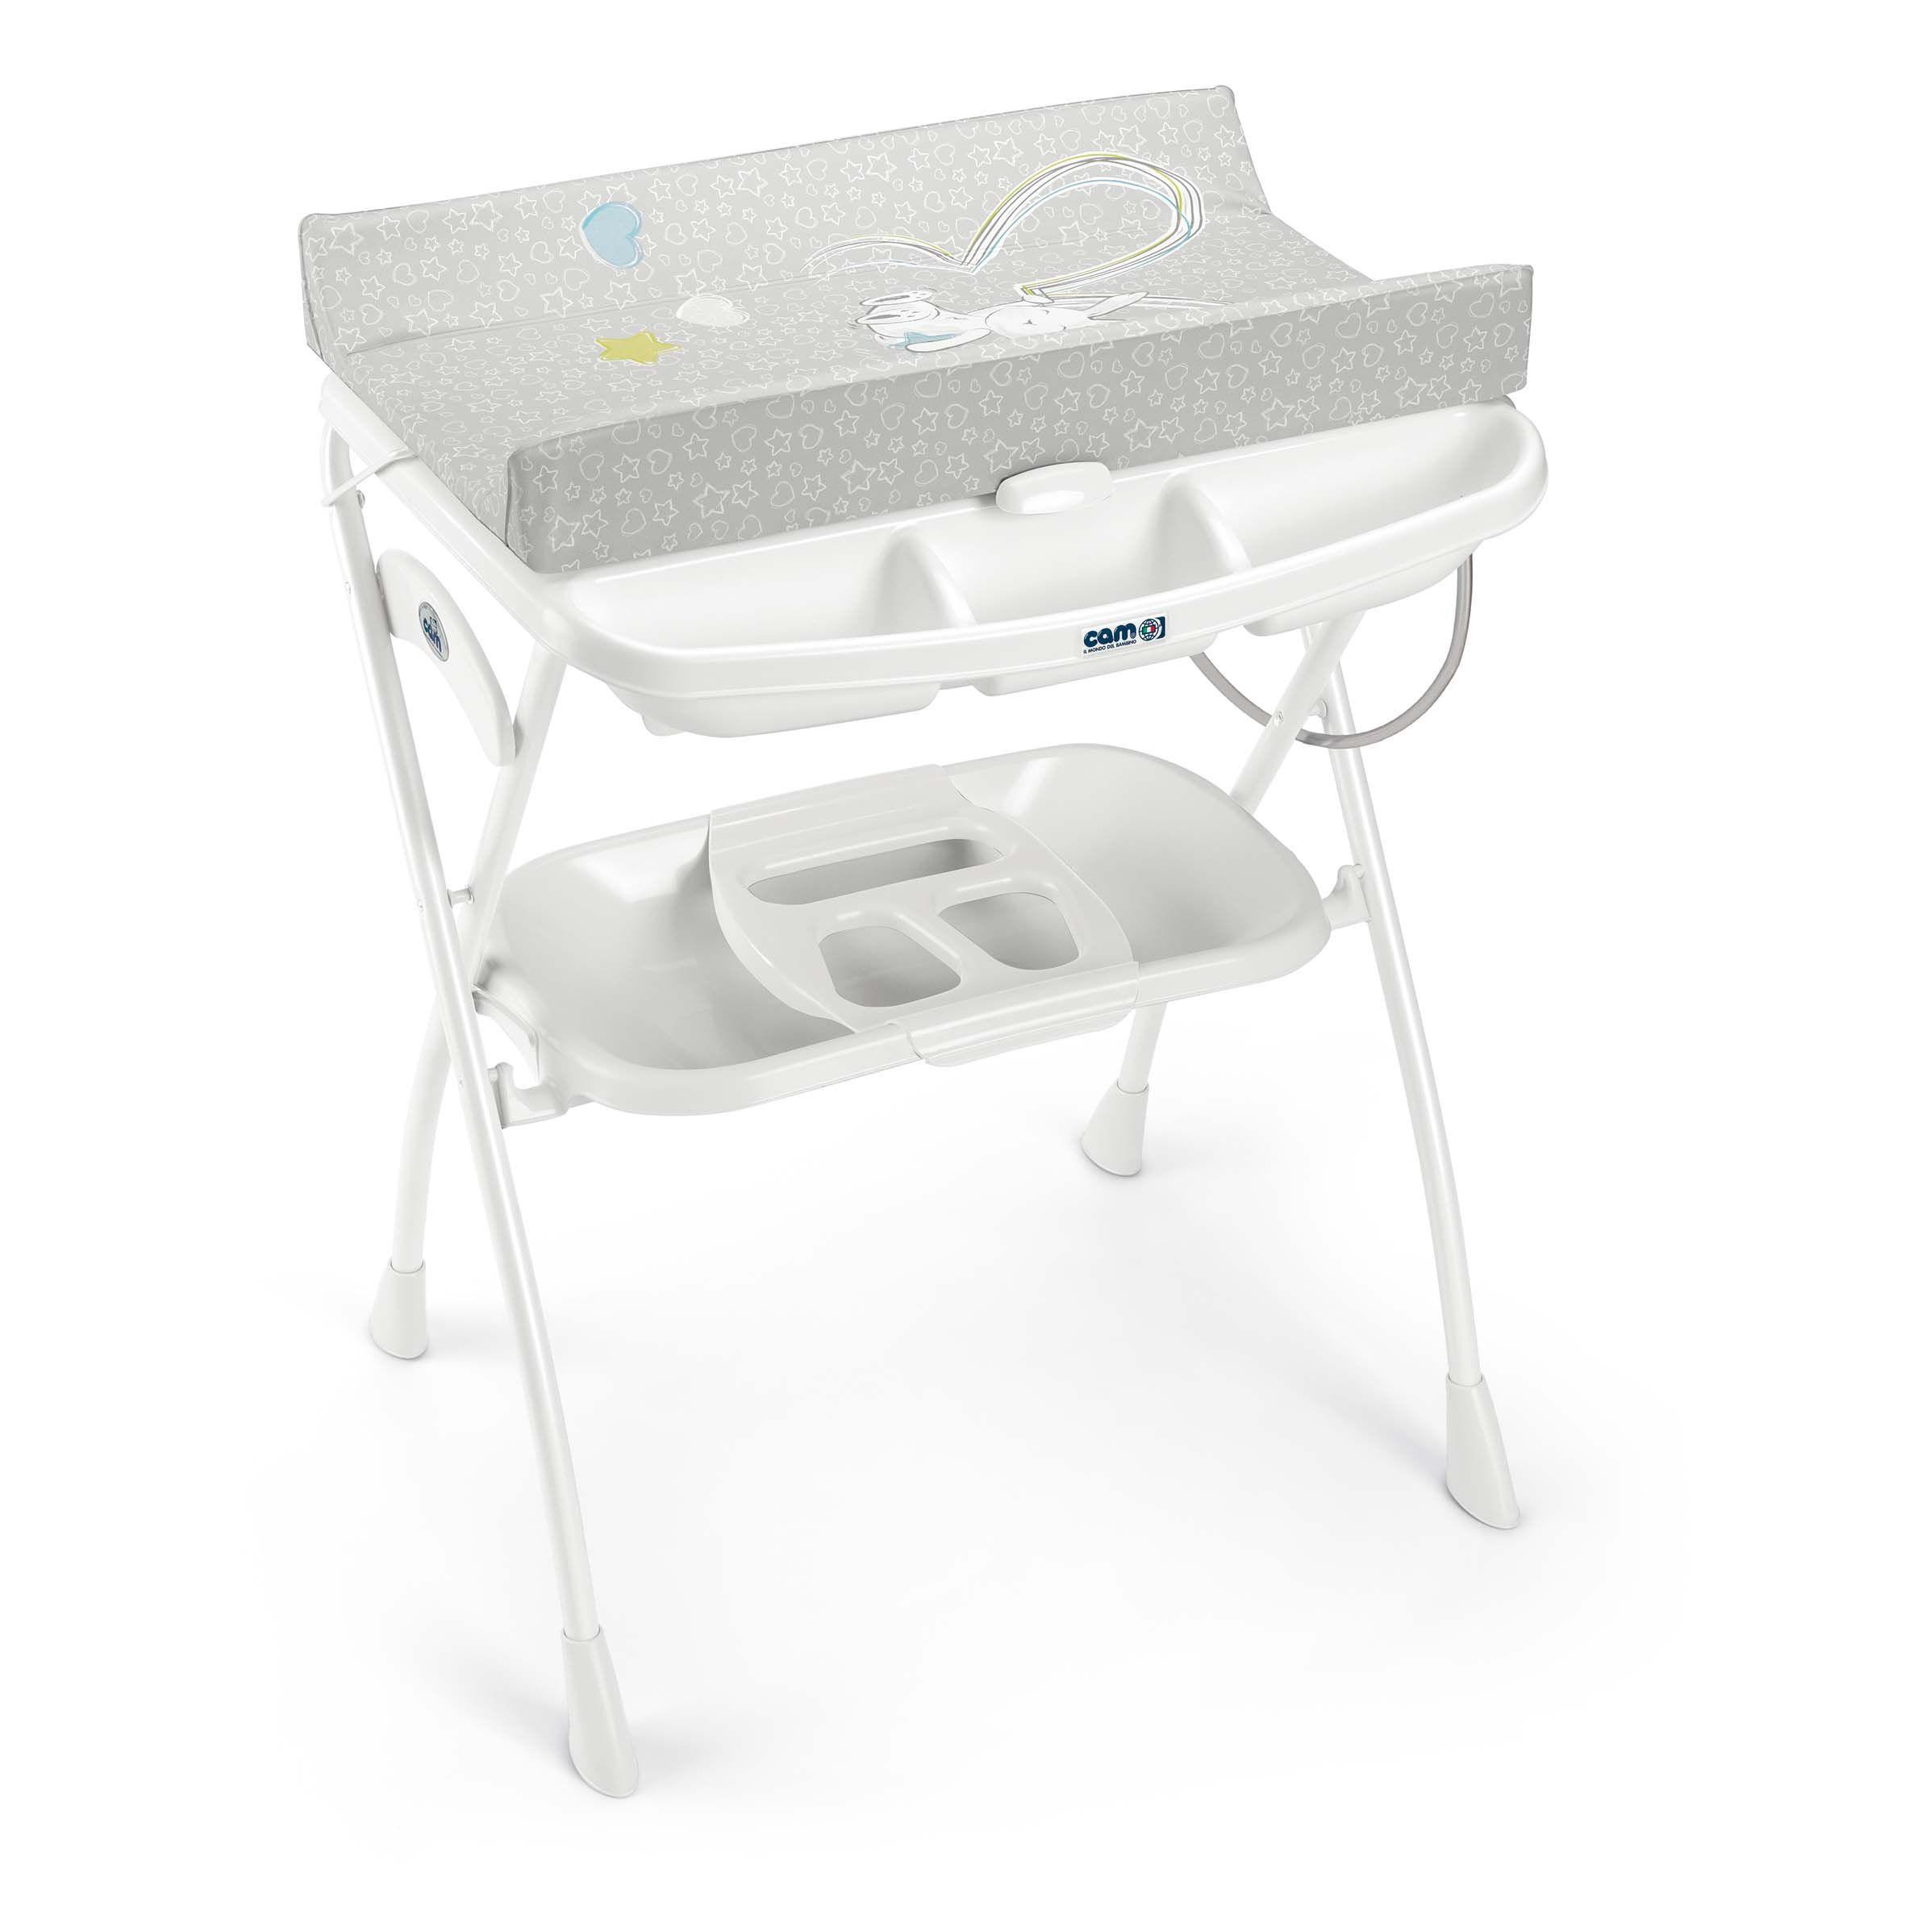 table langer avec baignoire volare cam avis. Black Bedroom Furniture Sets. Home Design Ideas